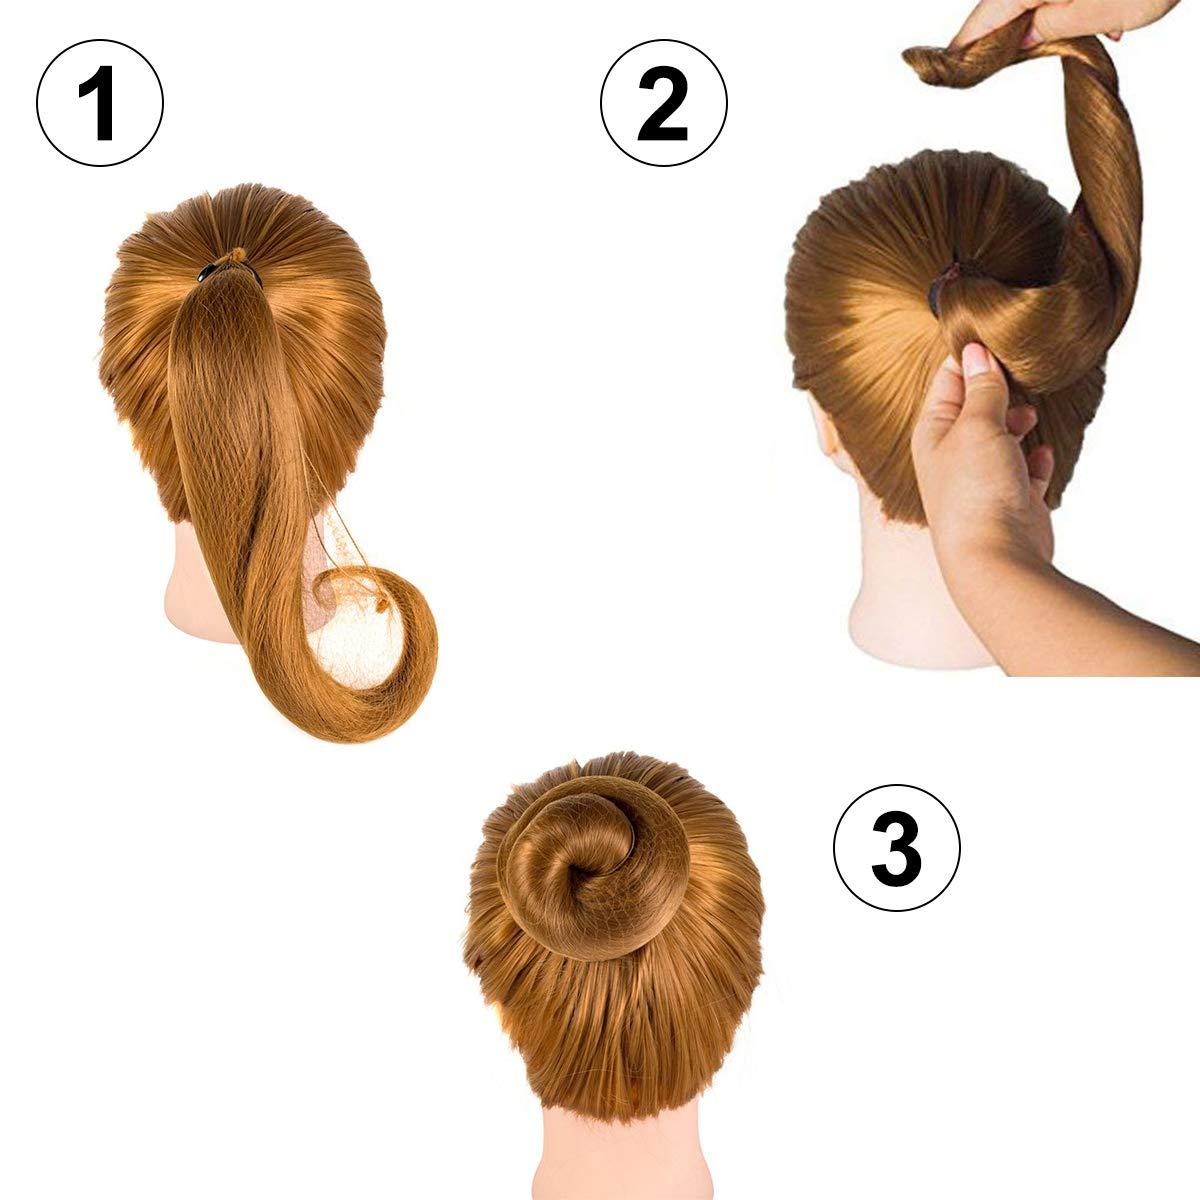 Dancewear Ballet Bridal Accessories Pair of Girls Plain Mesh Bun Hair Nets Set